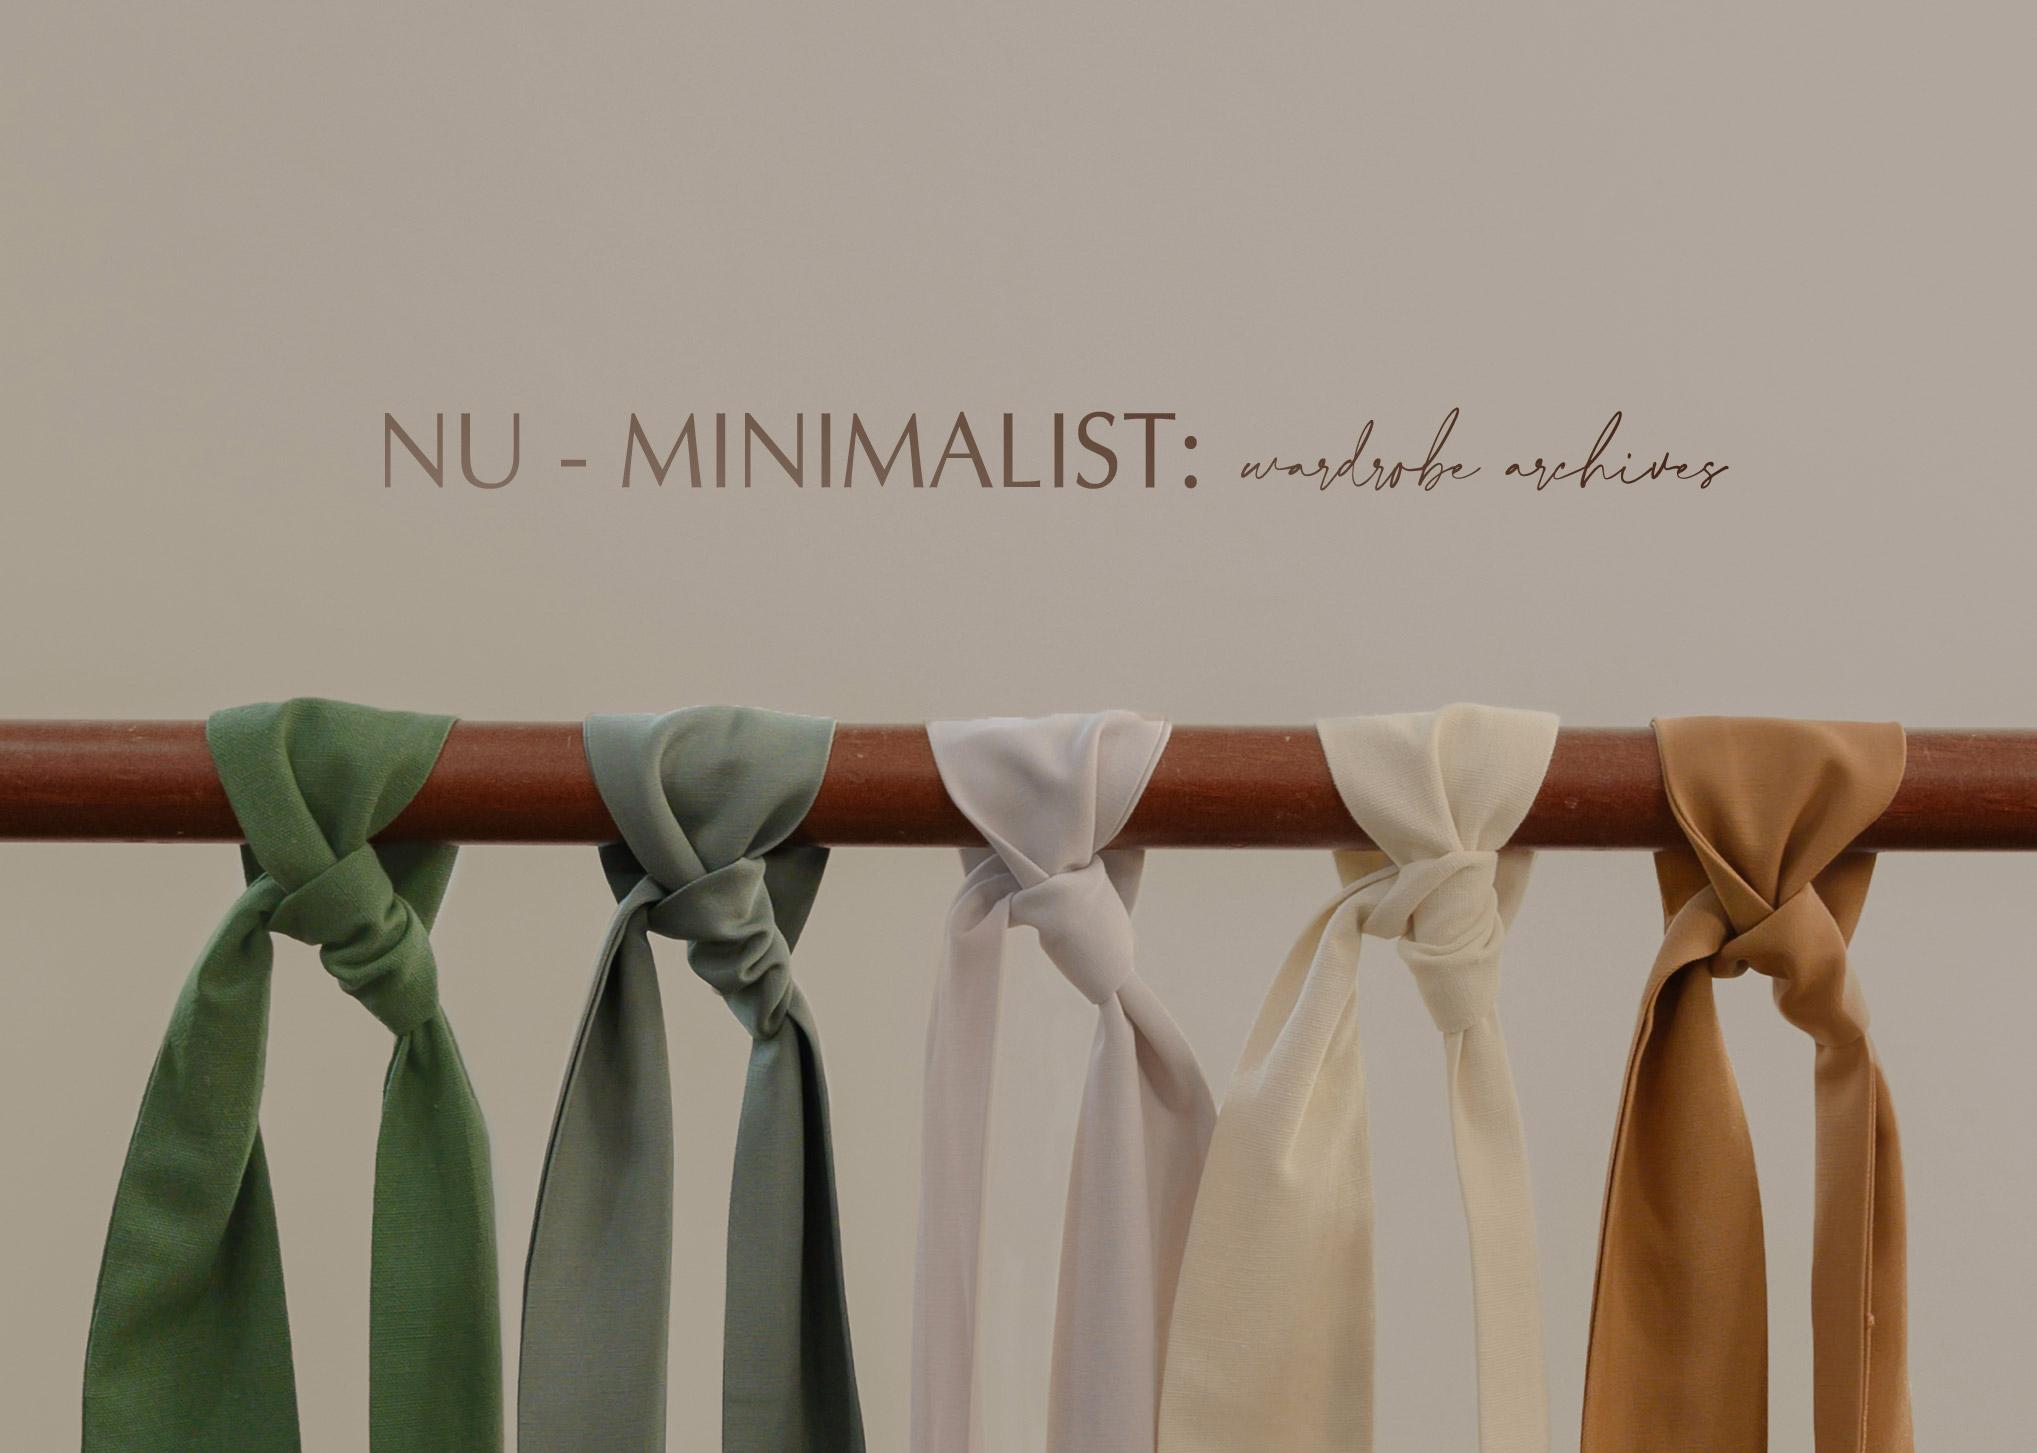 NU-MINIMALIST: wardrobe archives